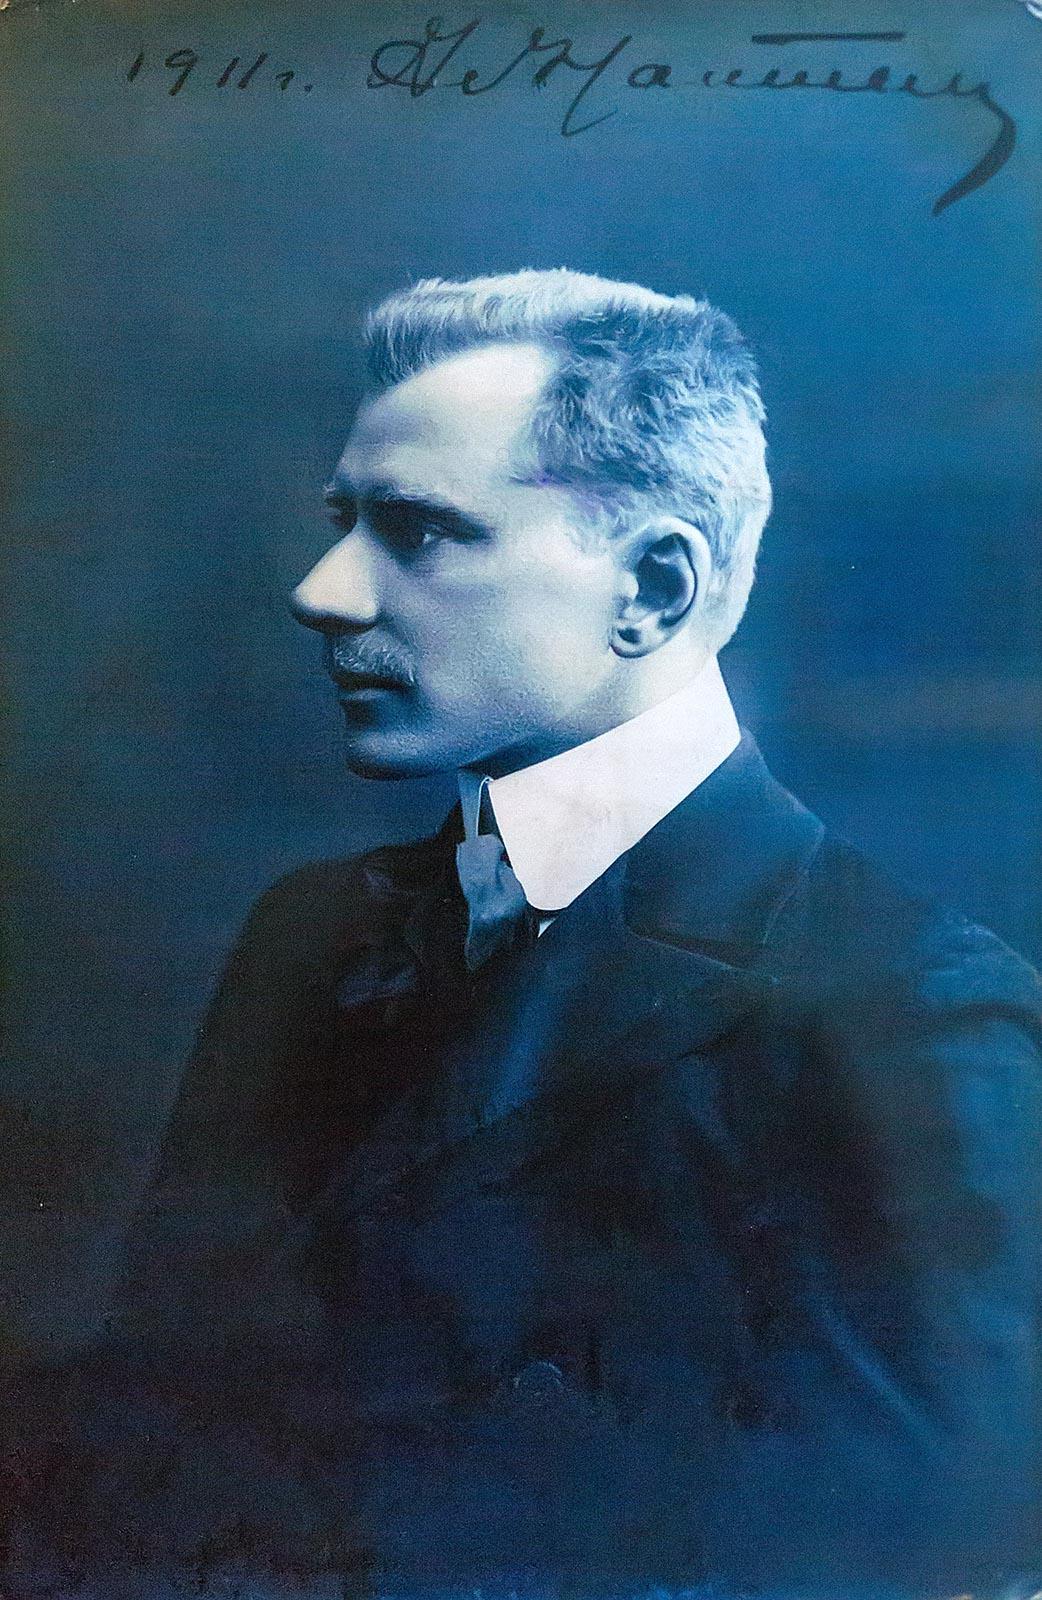 Фото №212032. Александр Фердинандович Мантель 1880, Санкт-Петербург - 1935, Москва